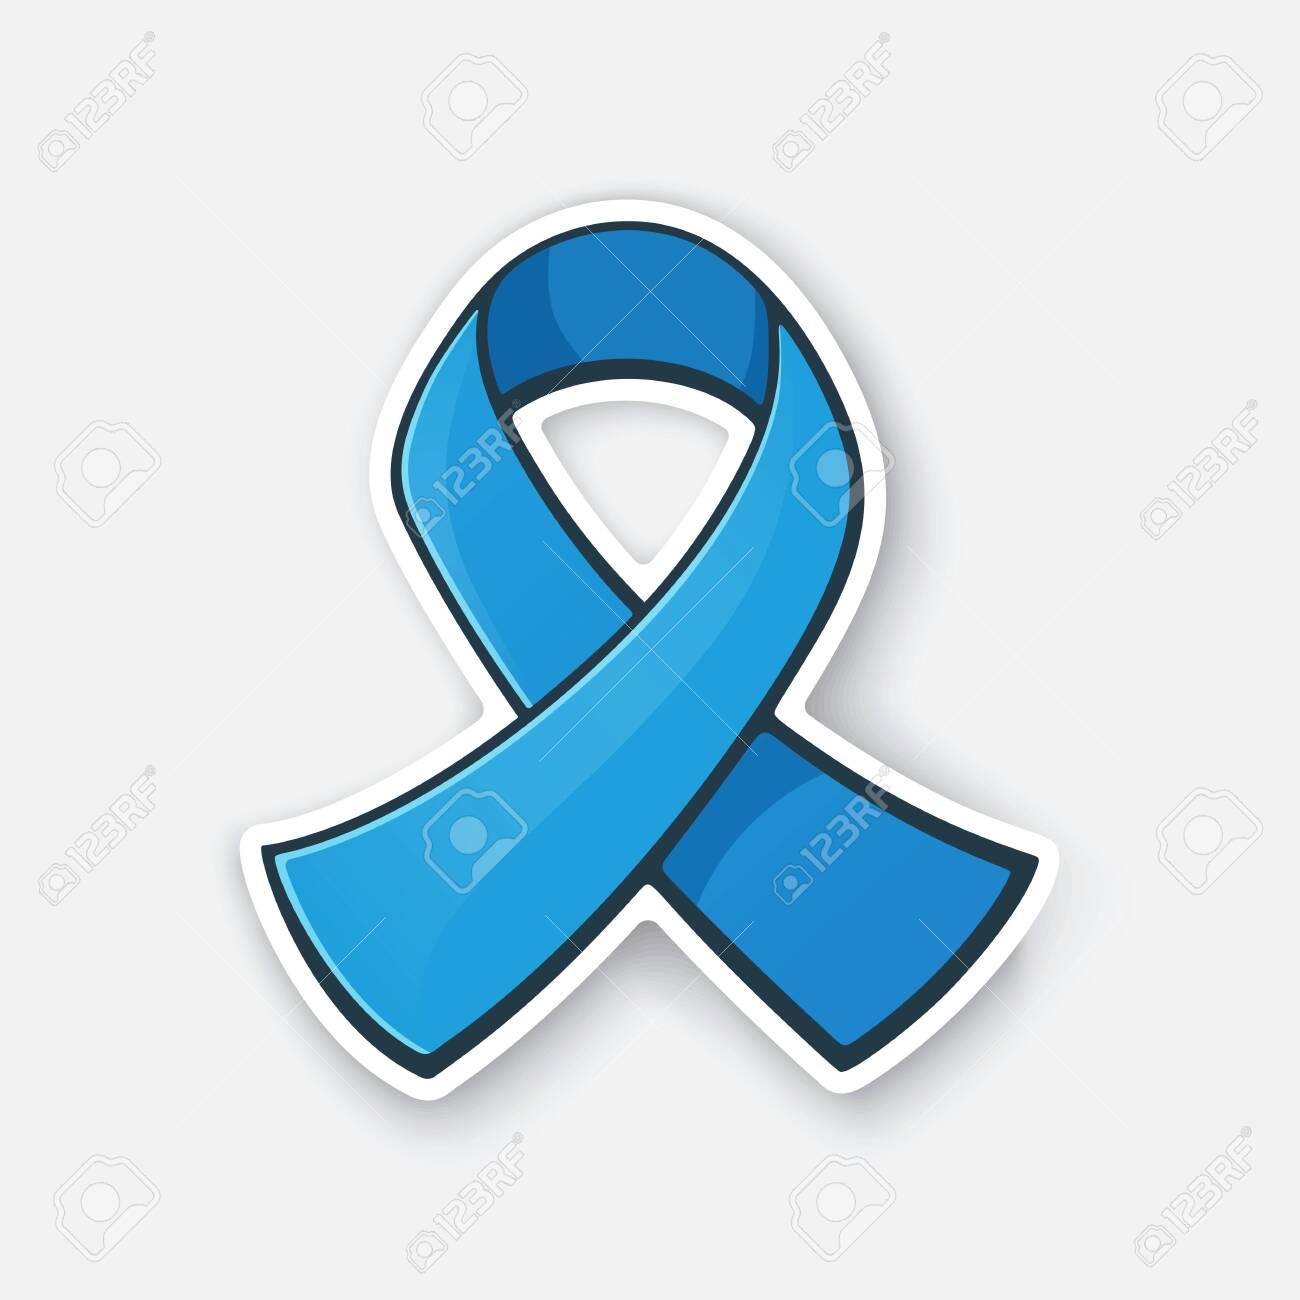 Vector Illustration Ribbon At Blue Color International Symbol Royalty Free Cliparts Vectors And Stock Illustration Image 139699072